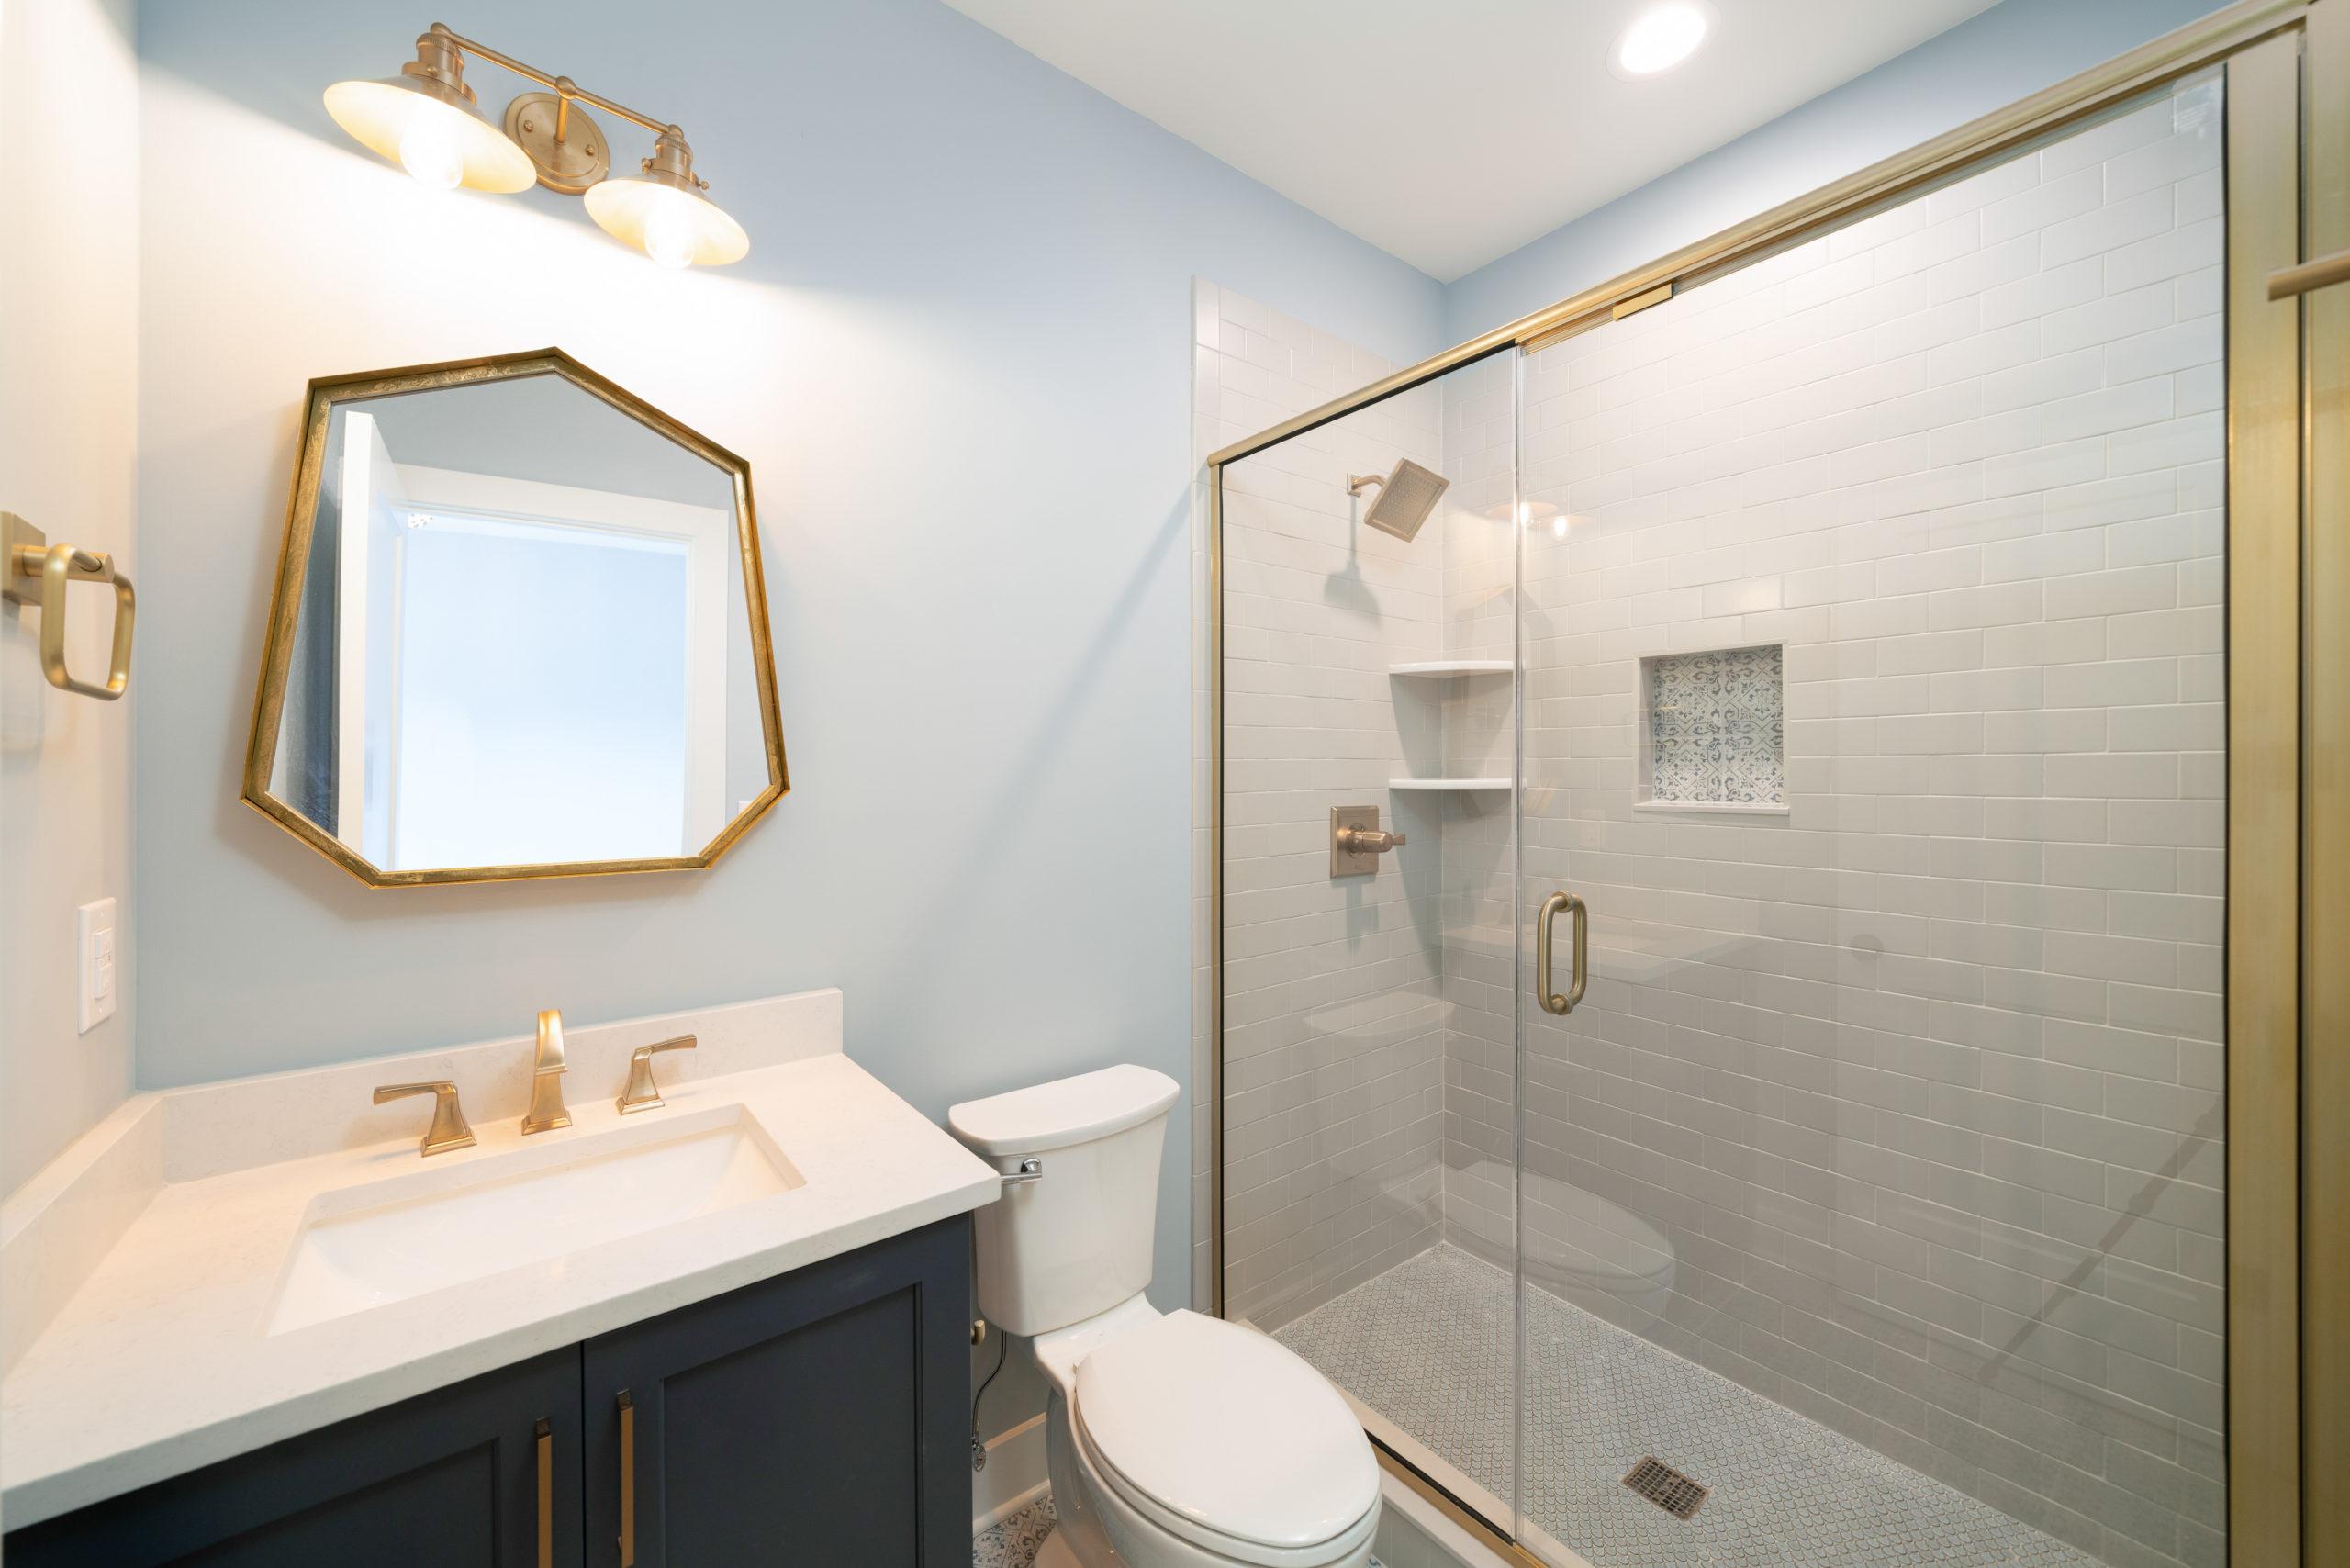 gold accen bathroom with black vanity